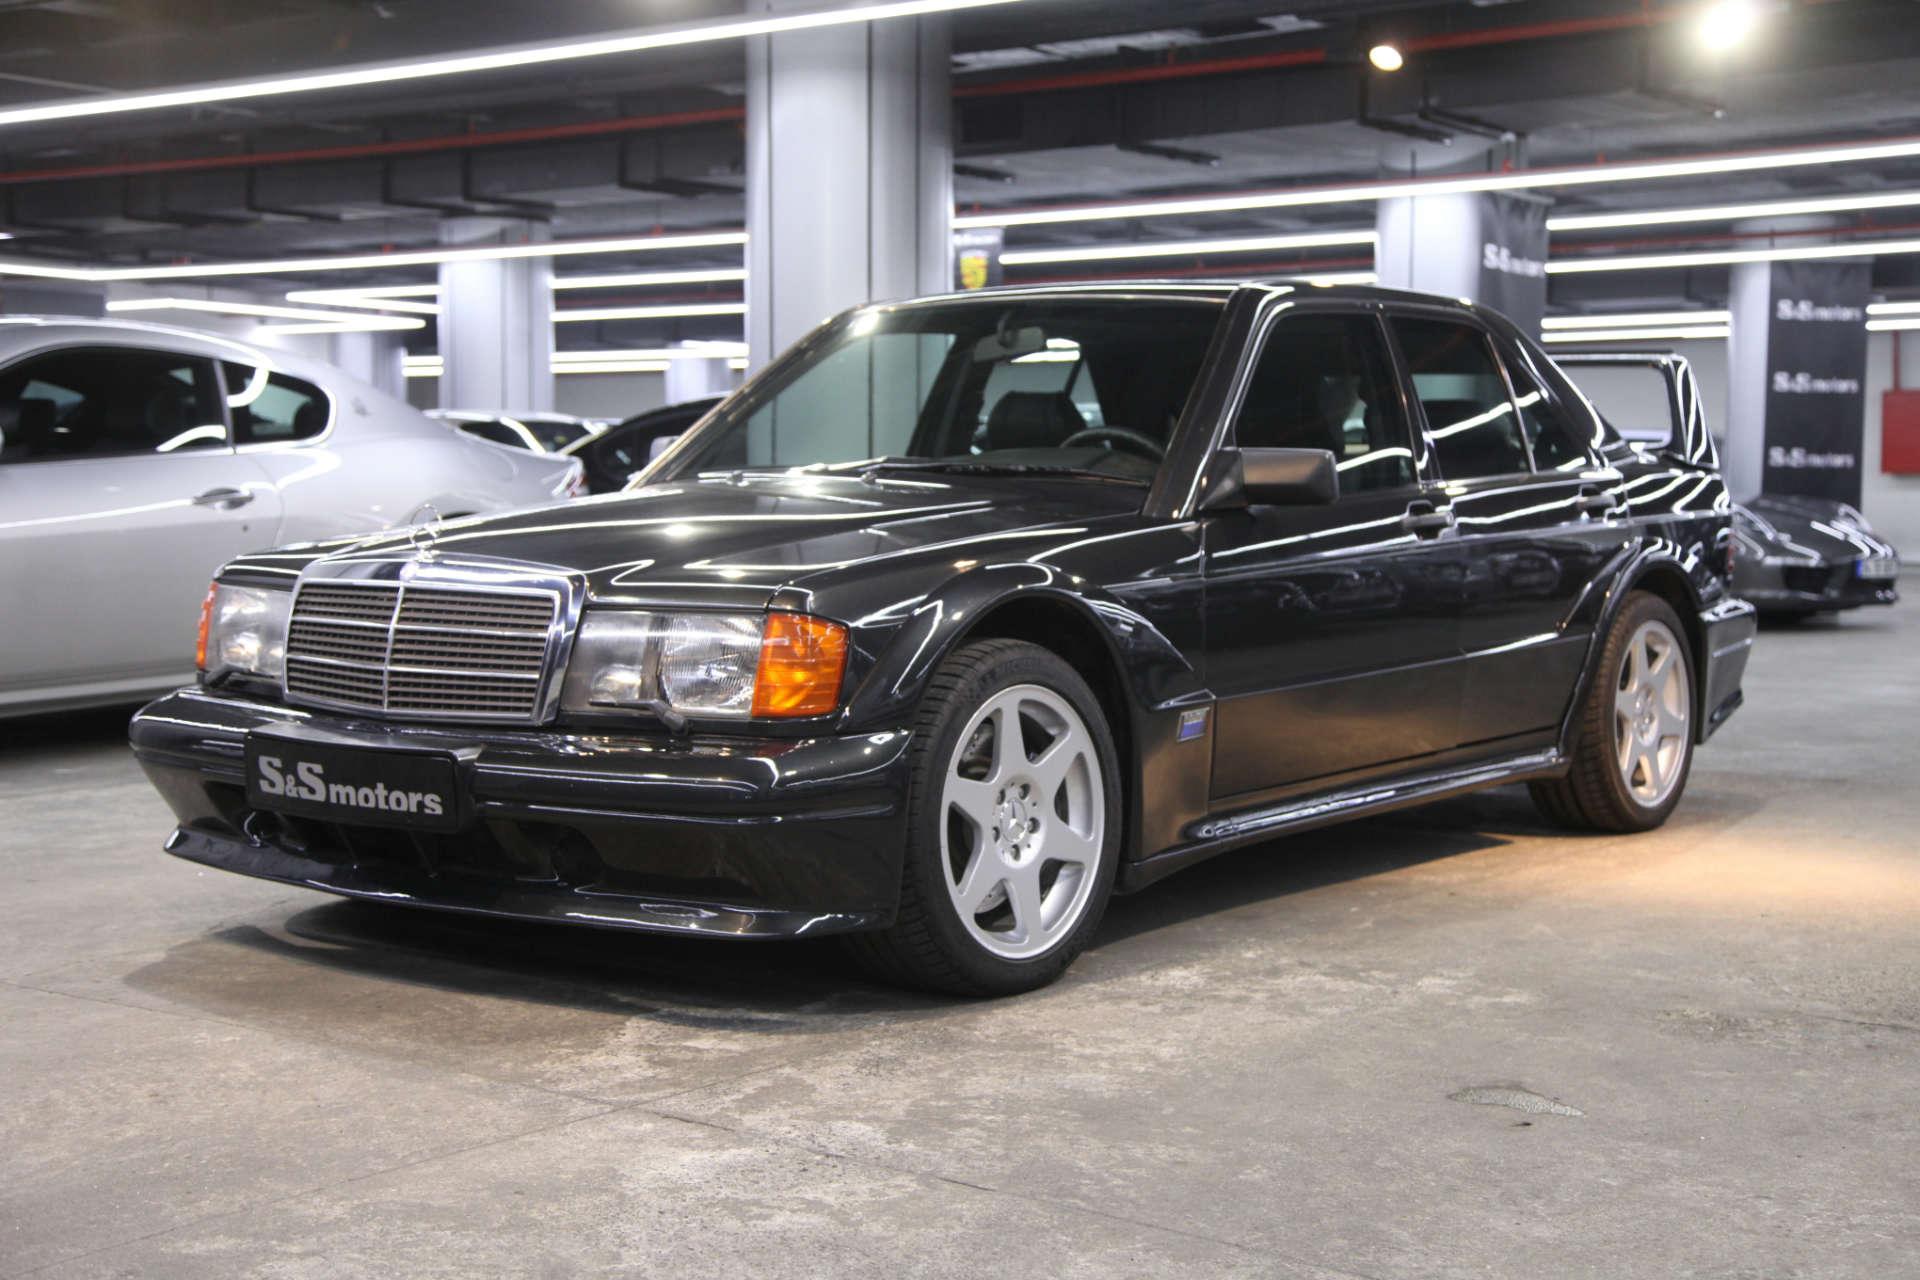 Mercedes 500, tarih ve evrim